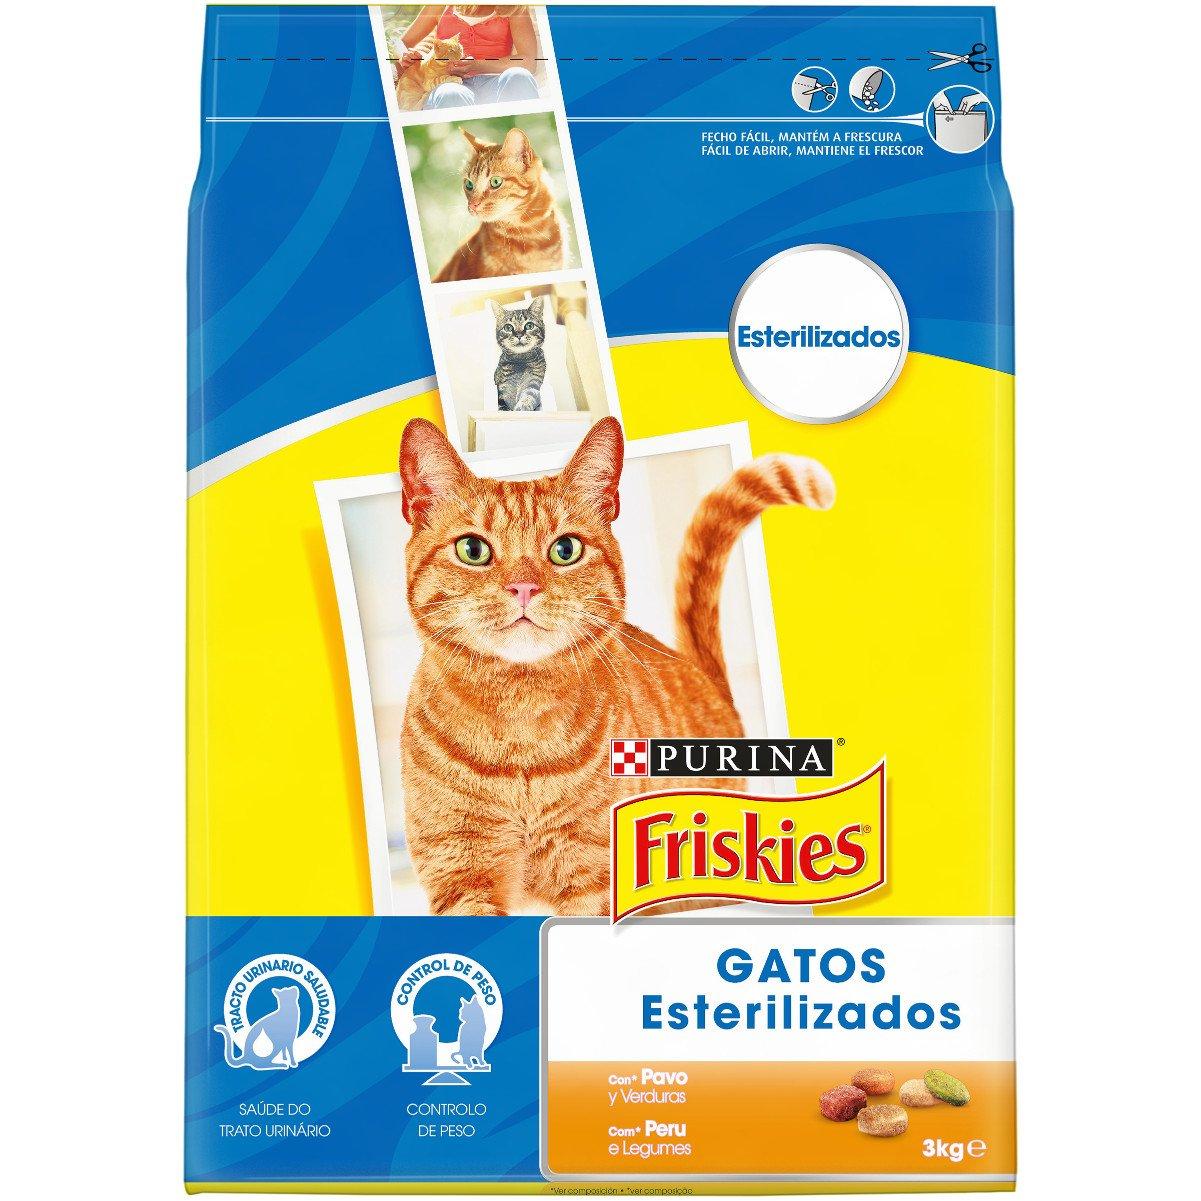 Purina - Friskies - Alimento para Gatos Esterilizados con ...